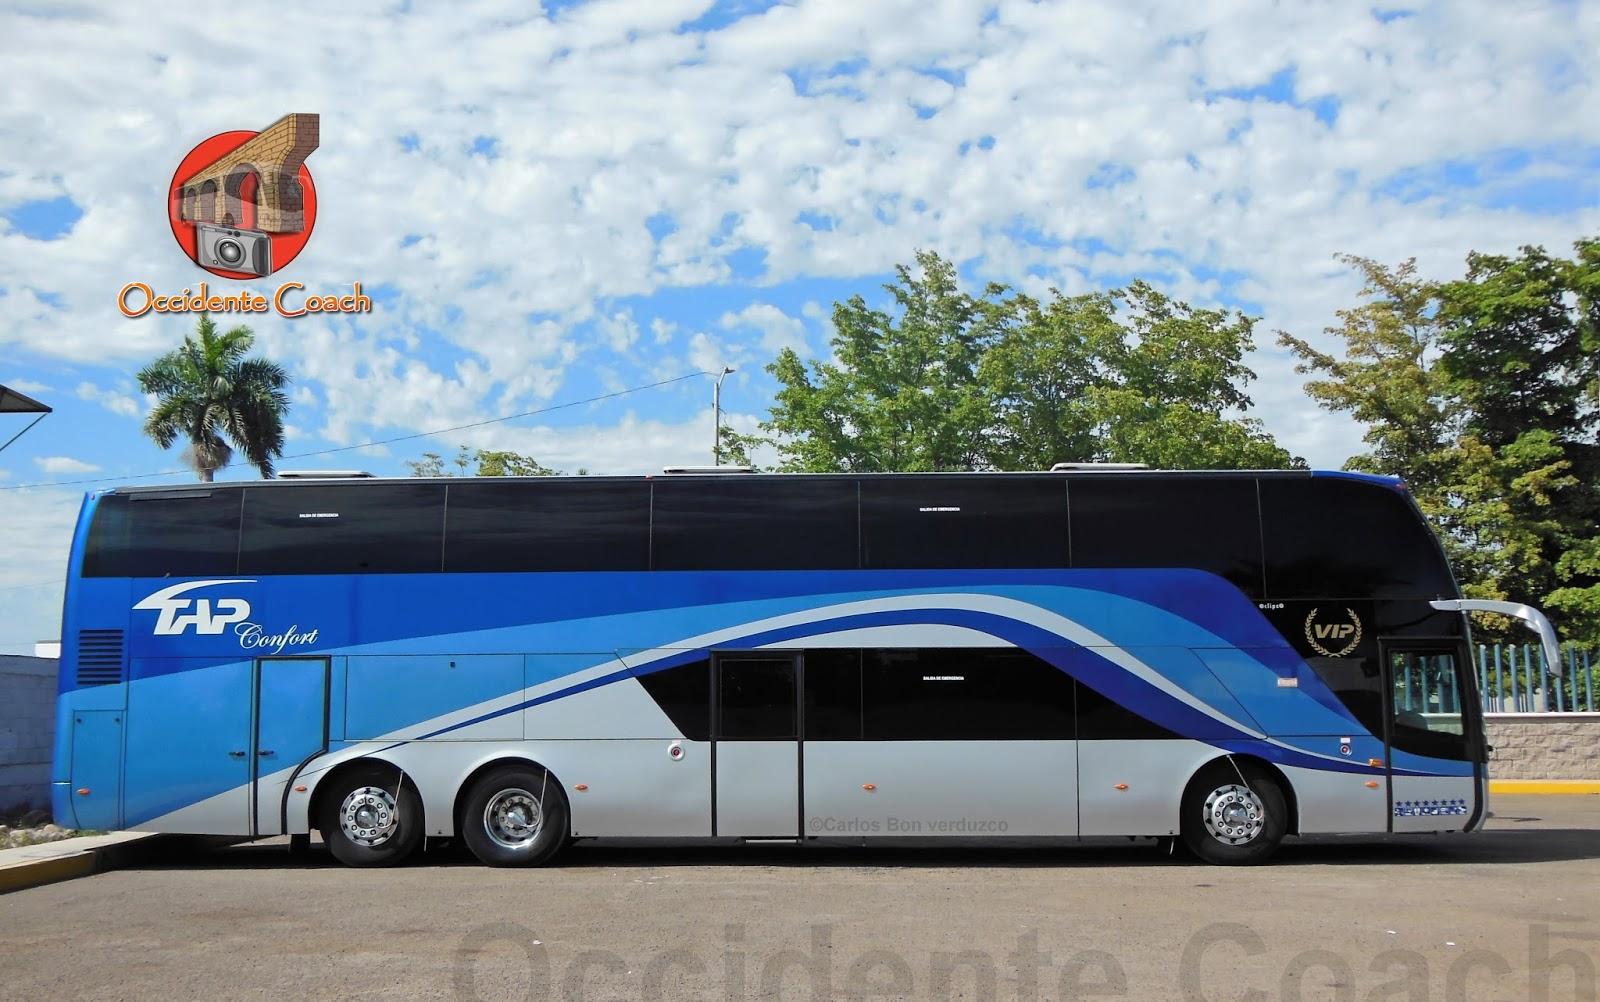 Occidente coach tap confort doble piso - Autobuses de dos pisos ...